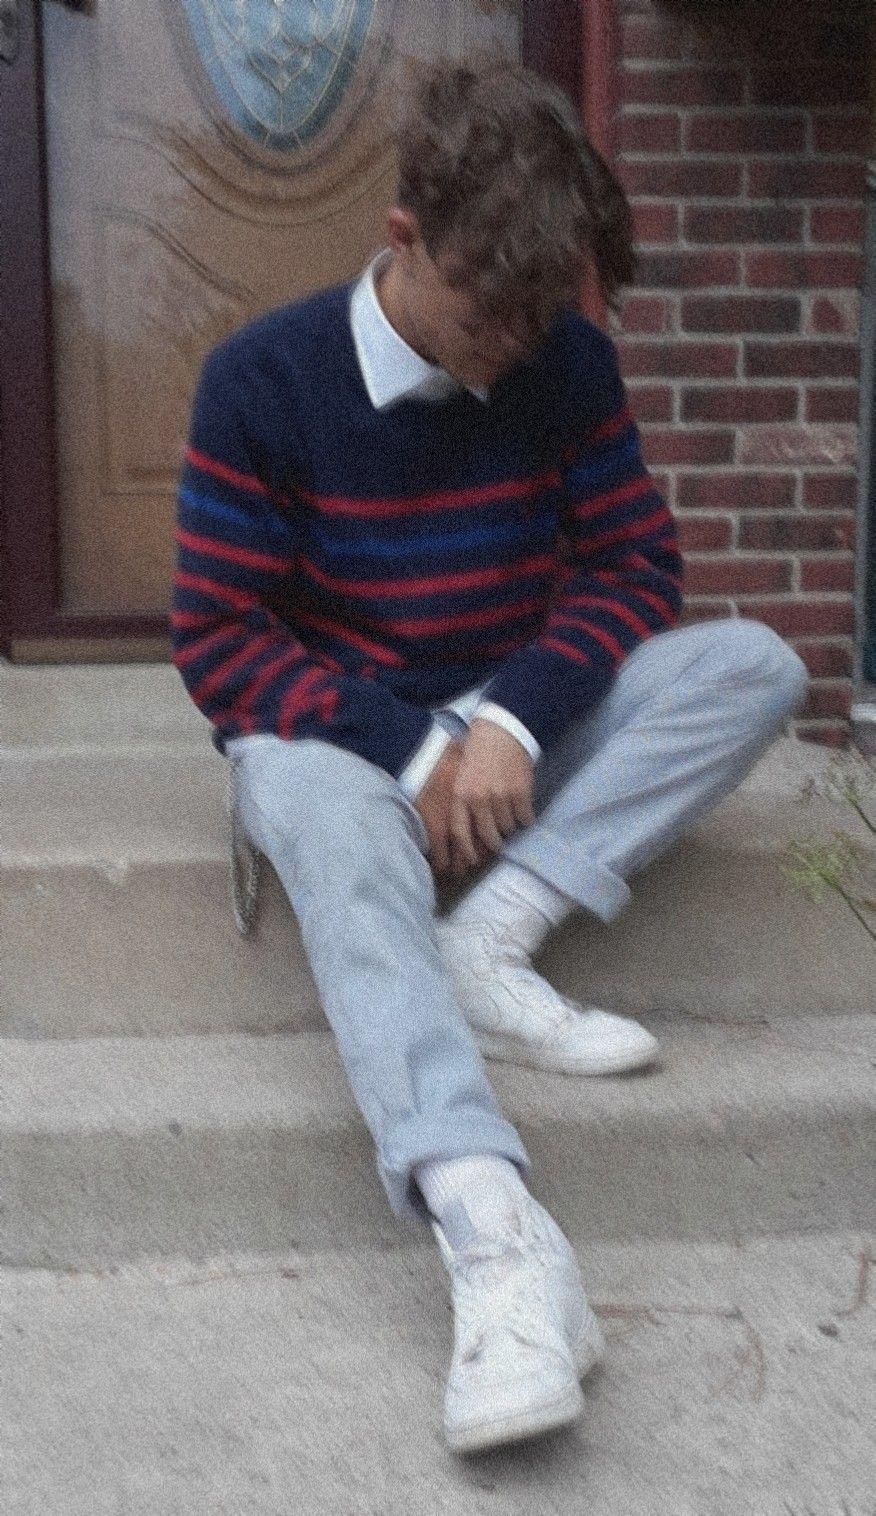 Sad Aesthetic Pictures Boy